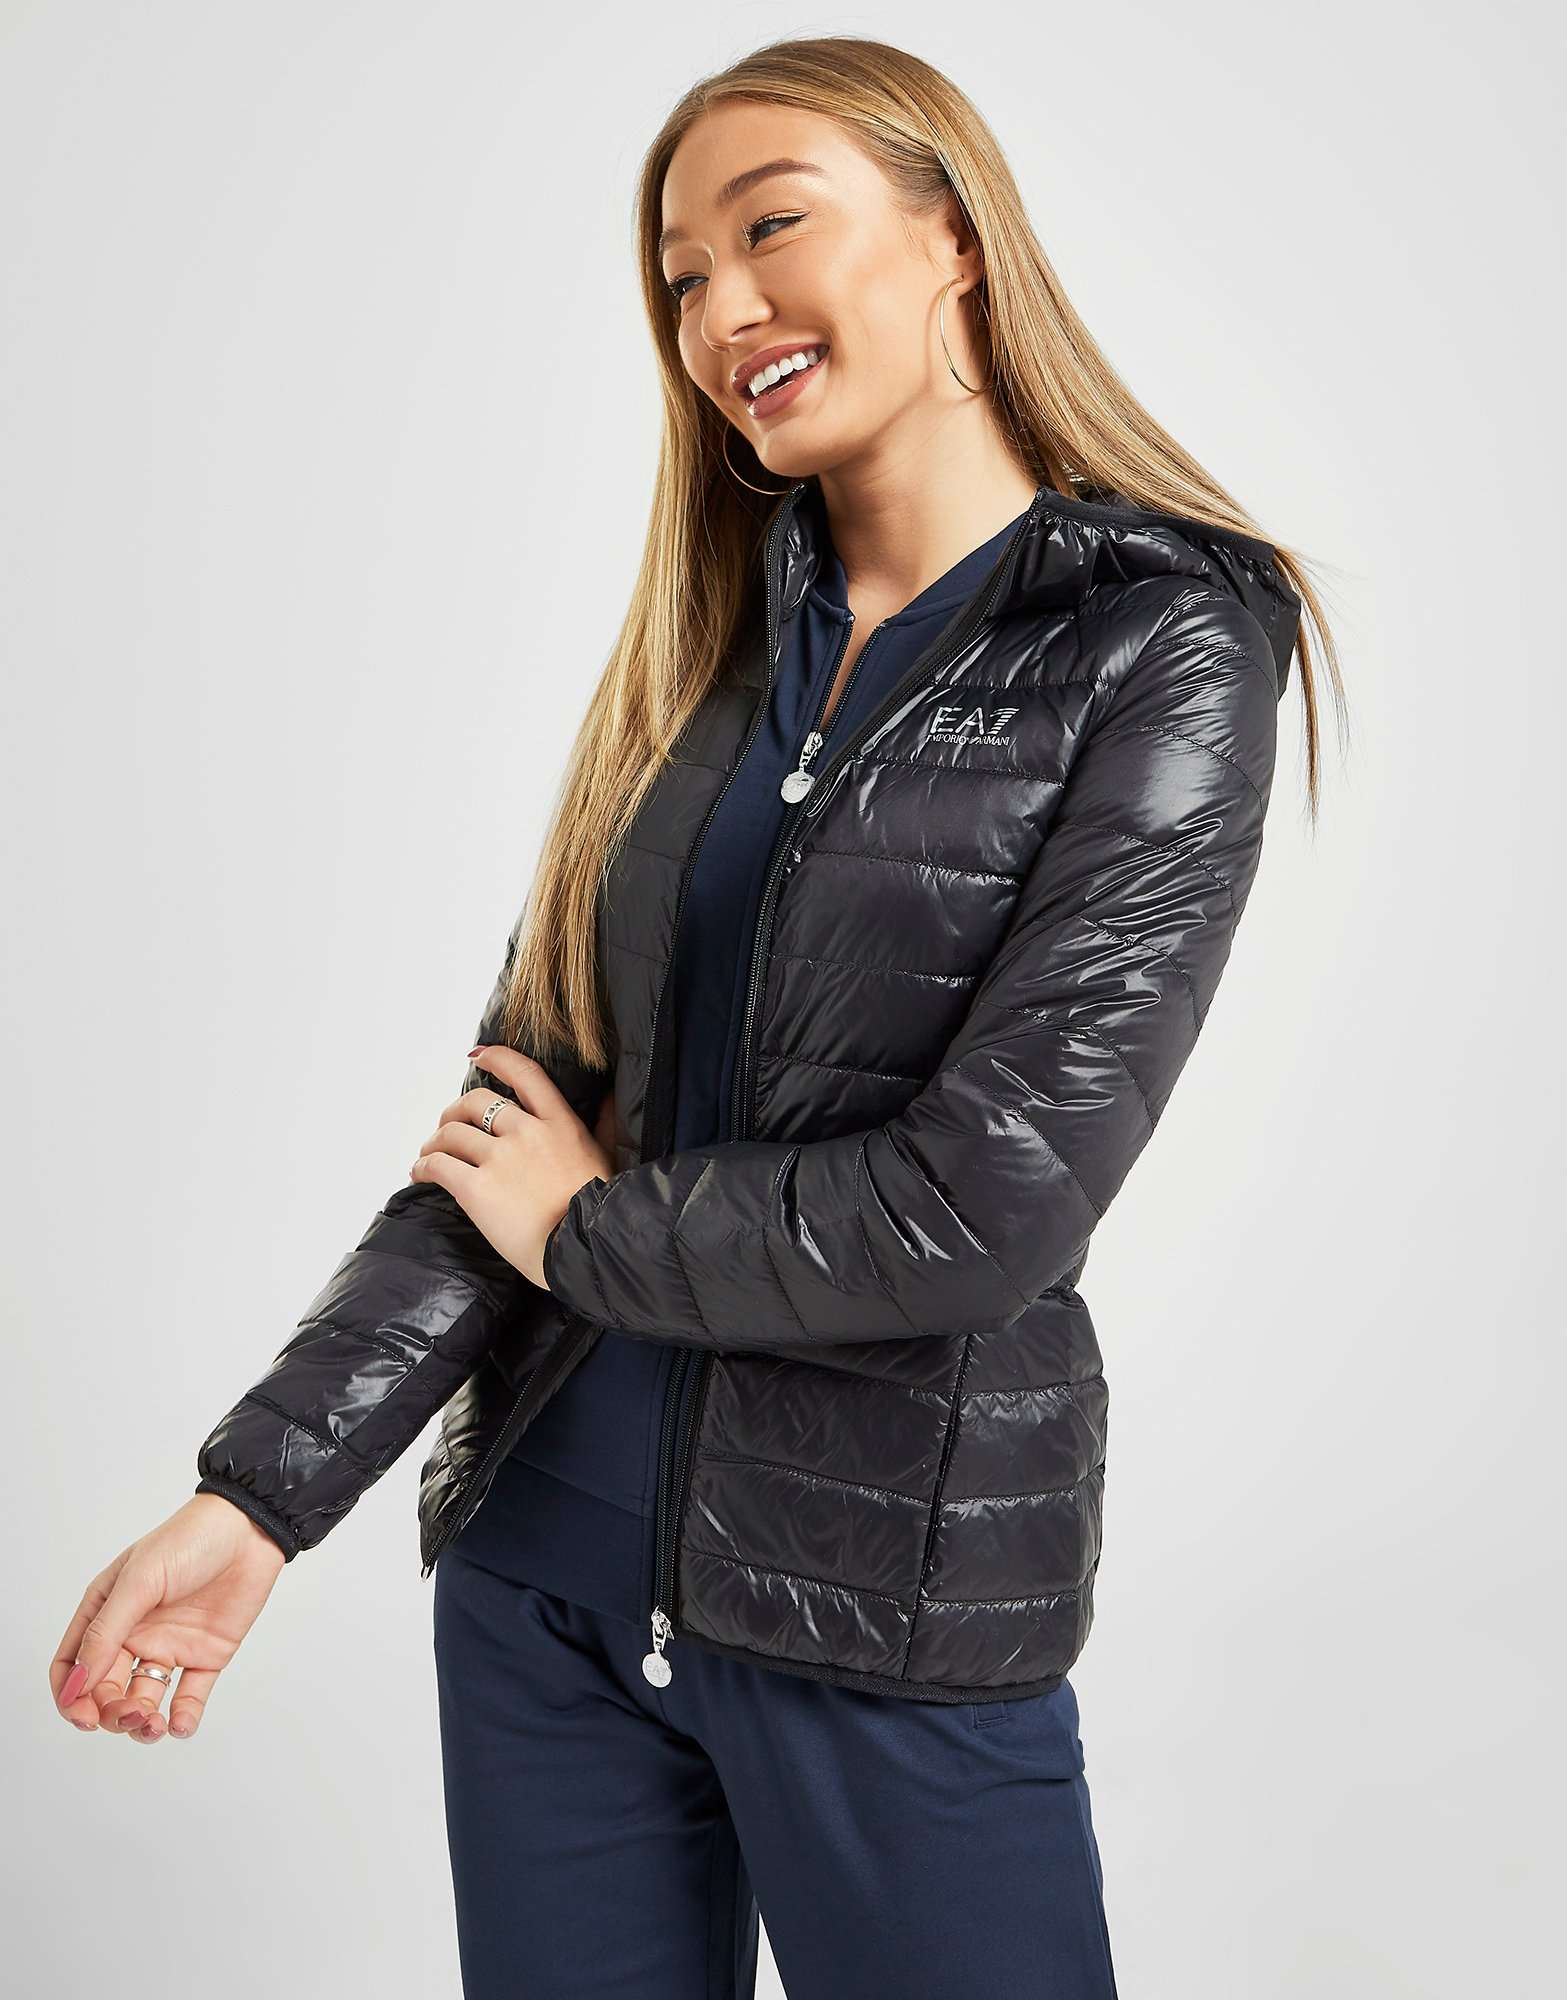 emporio armani ea7 core jacket jd sports